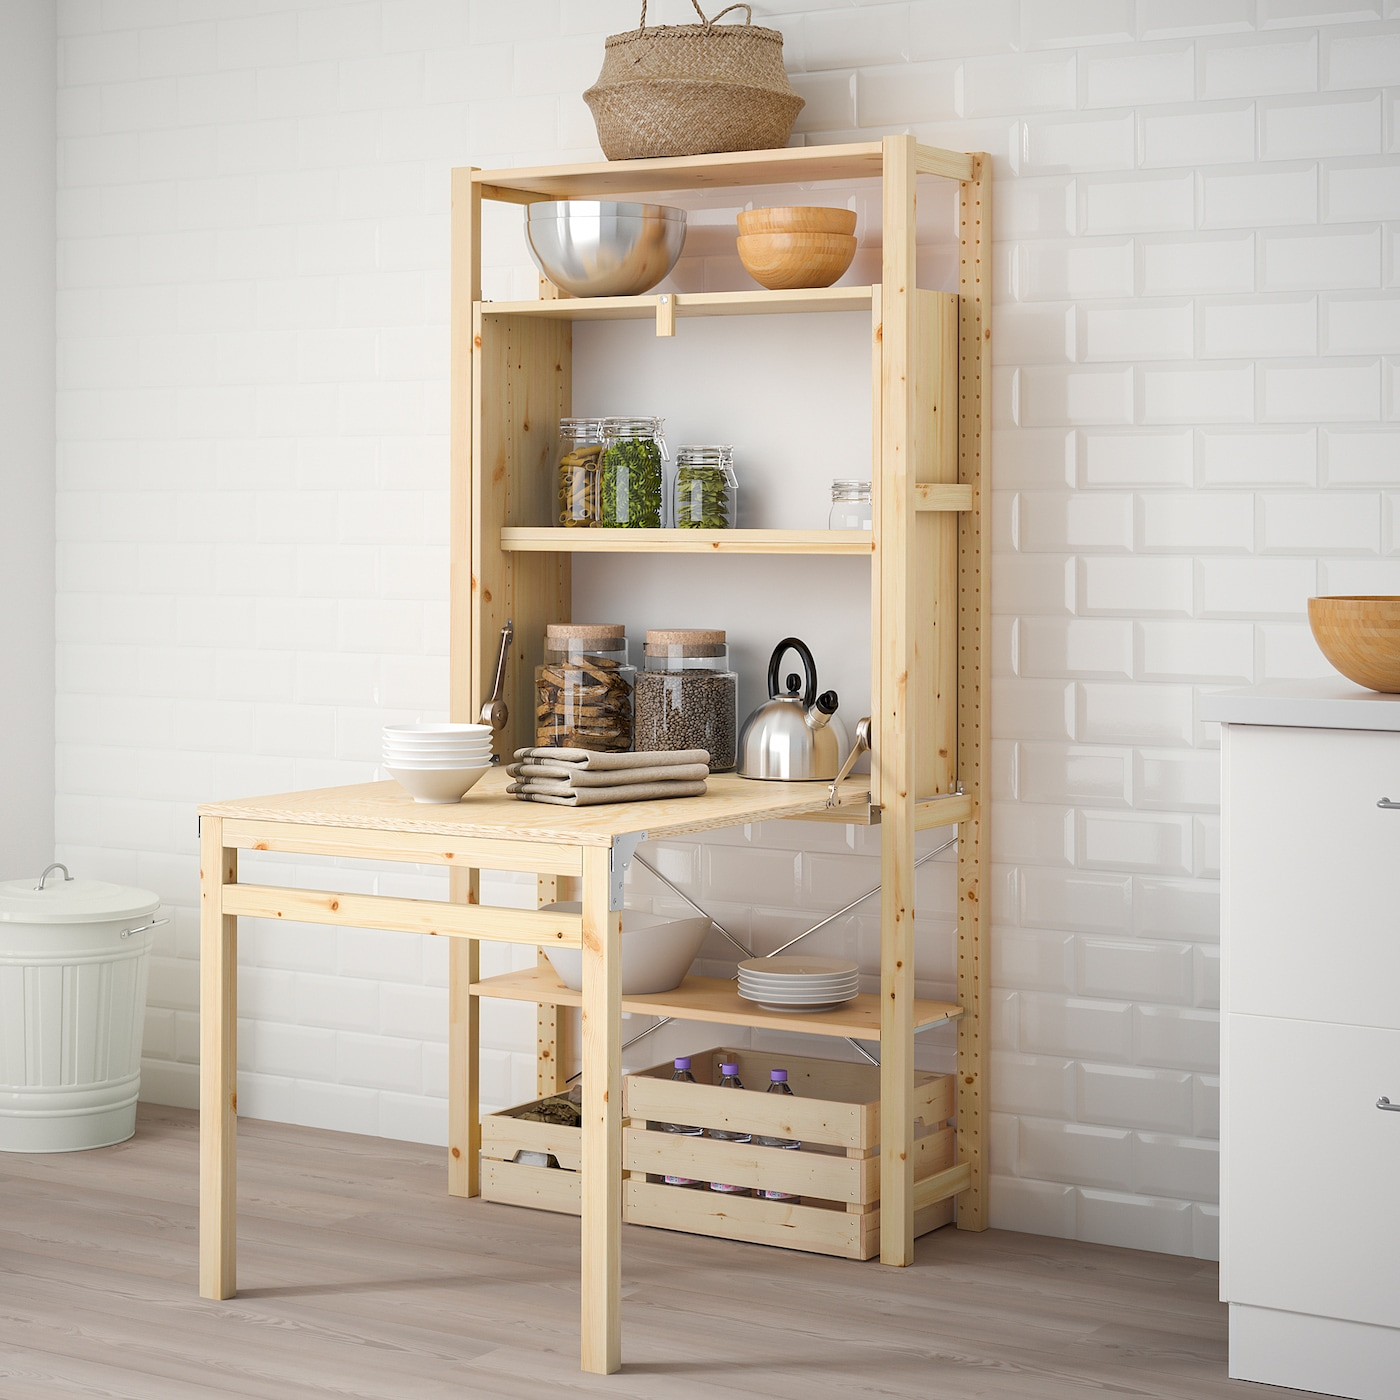 Ivar 1 Section/rgt Av Table Pliante 89X30-104X179 Cm destiné Table Salle A Manger Pliante Ikea